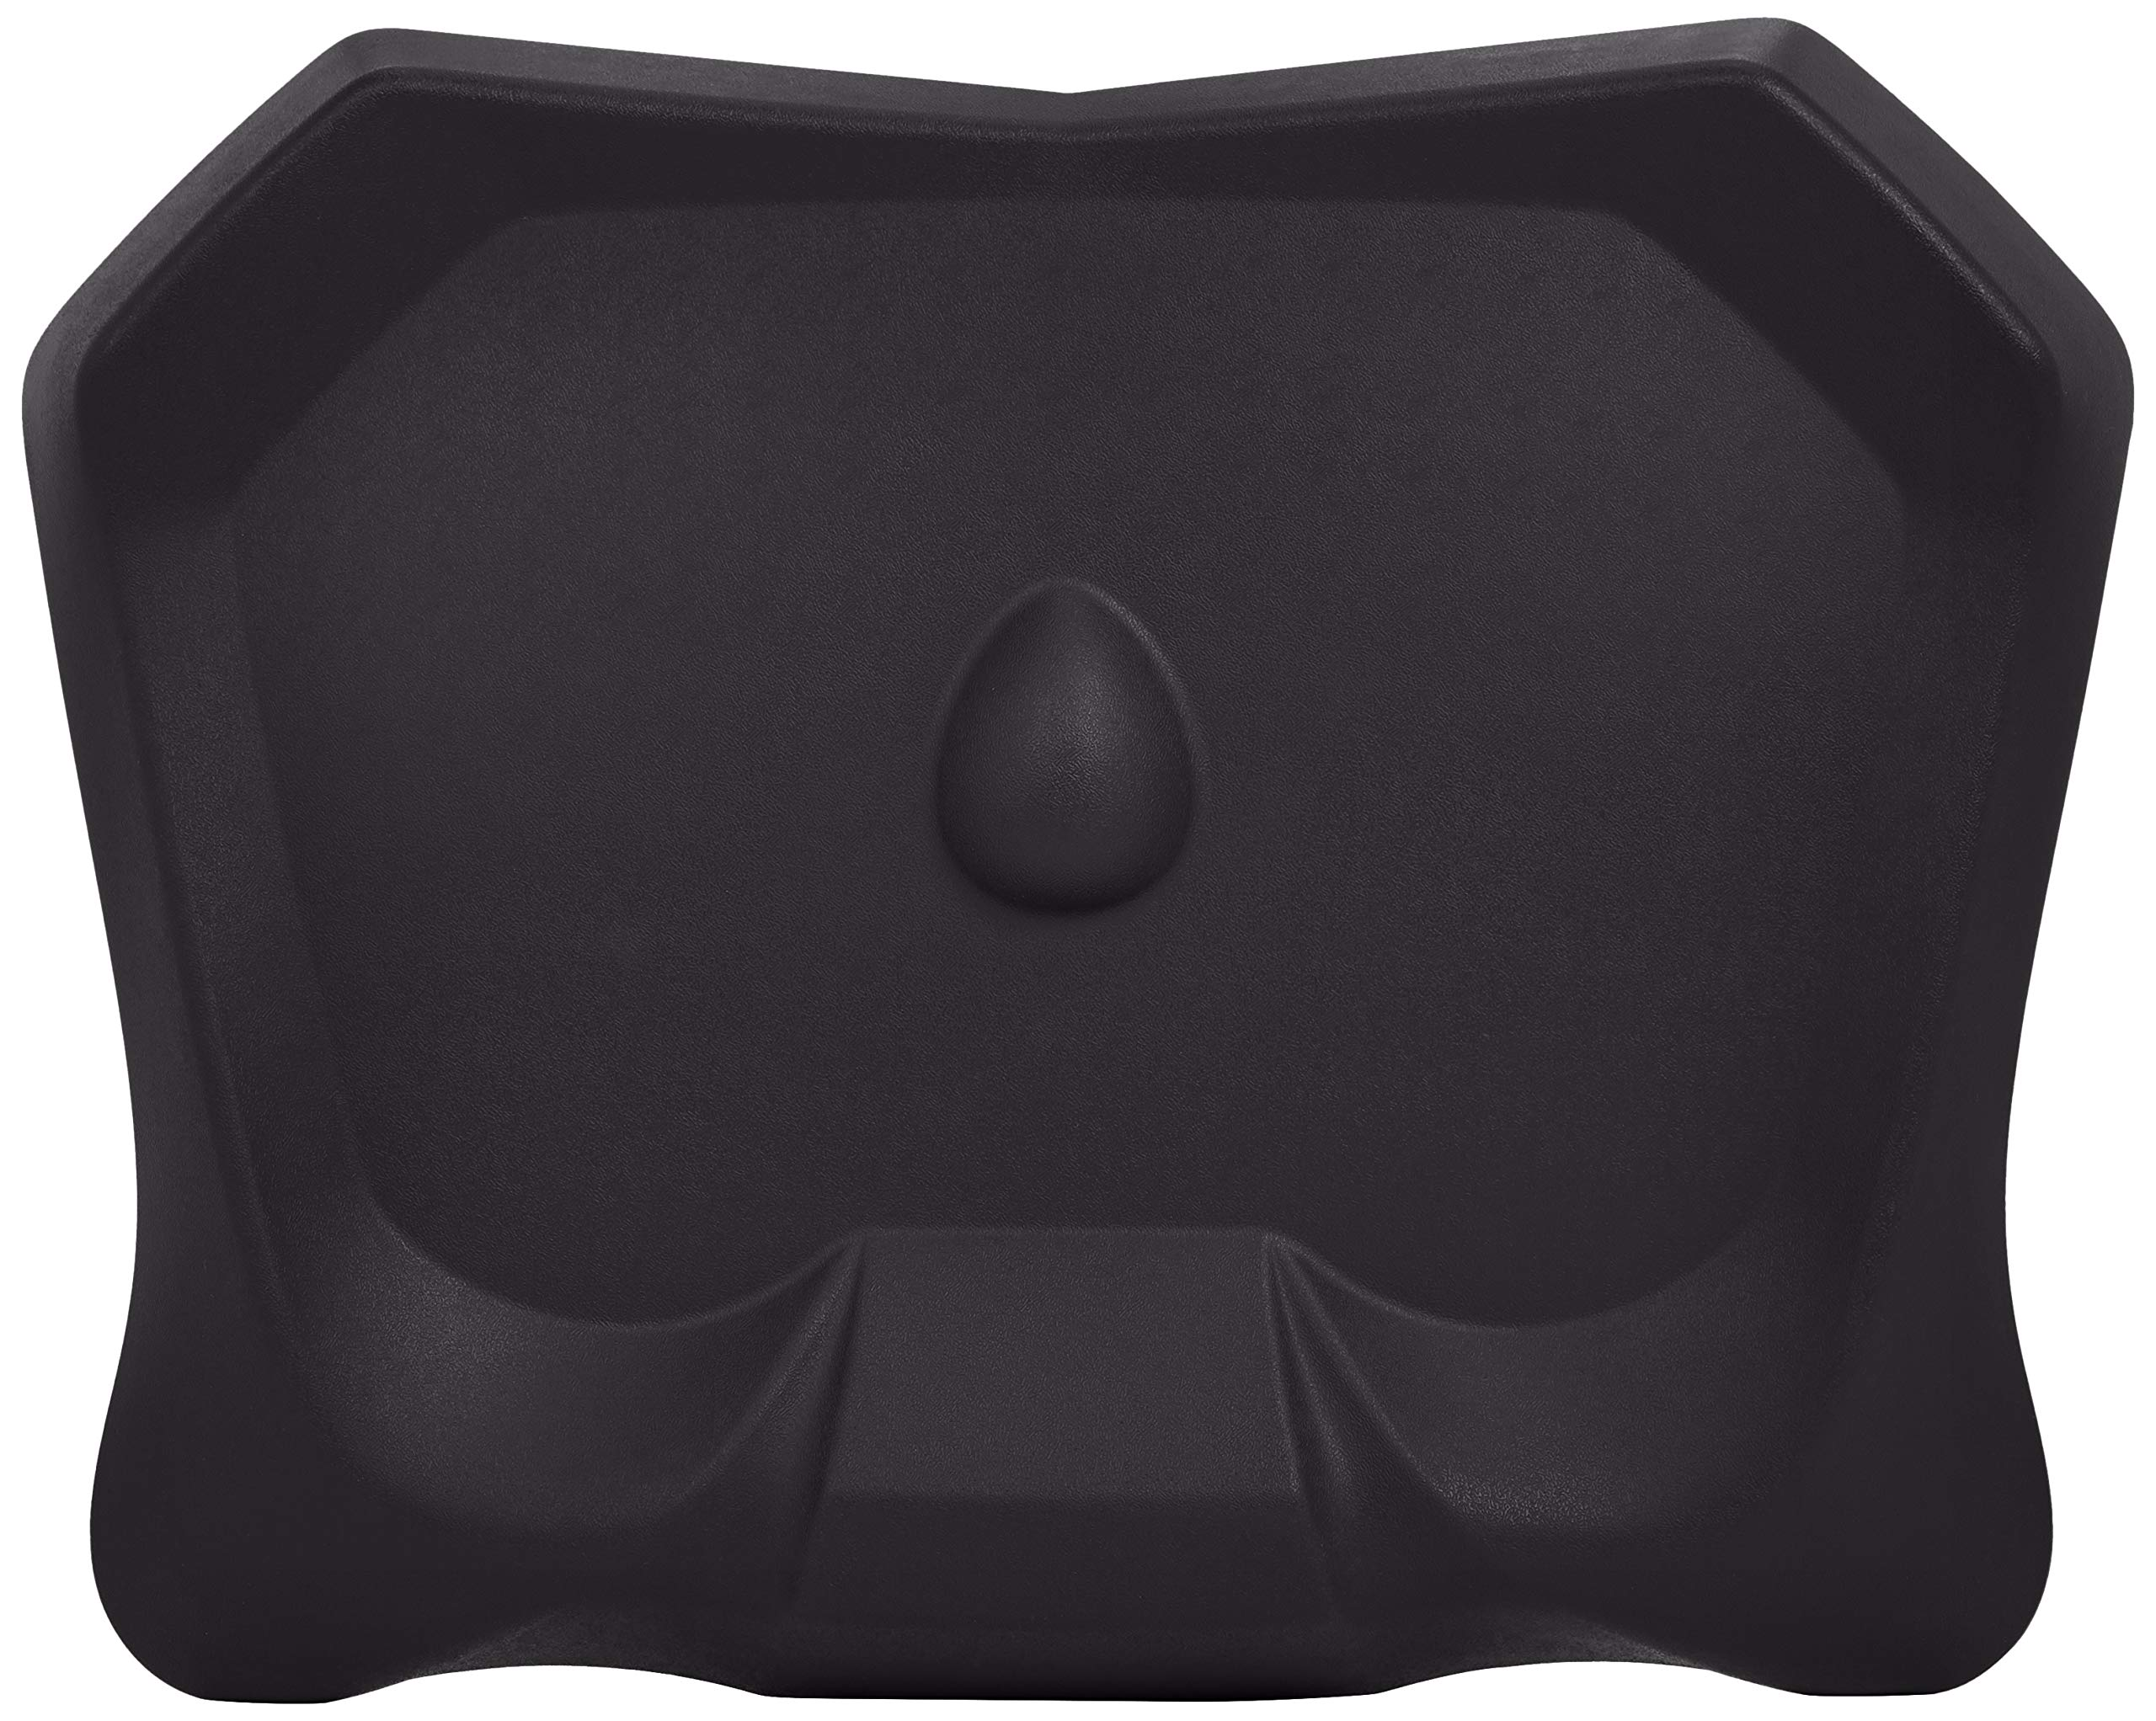 AmazonBasics Non-Flat Standing Desk Anti-Fatigue Mat, Black